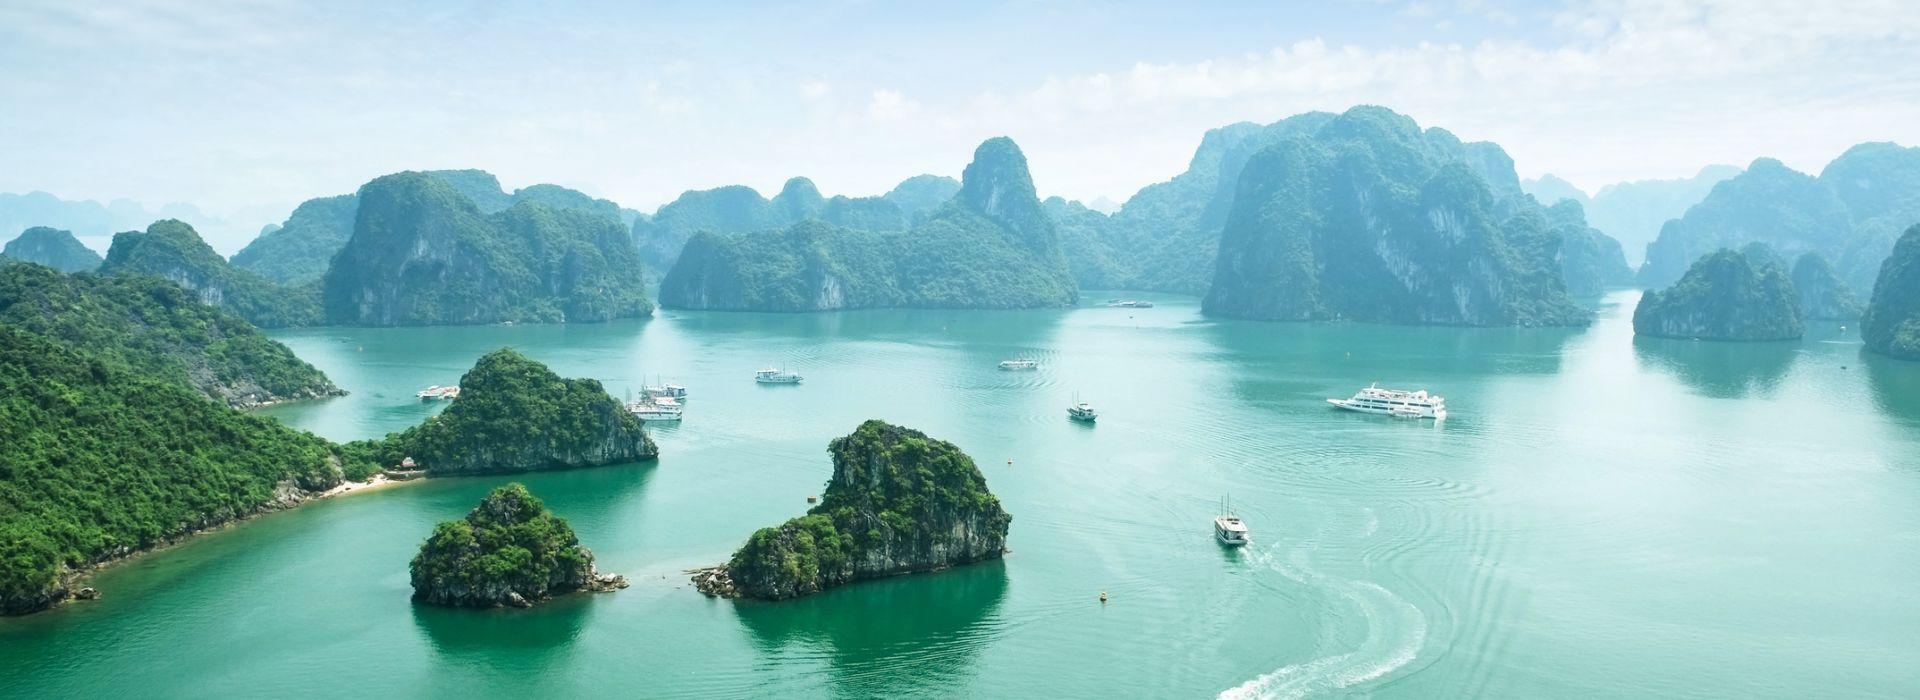 Mountains Tours in Vietnam